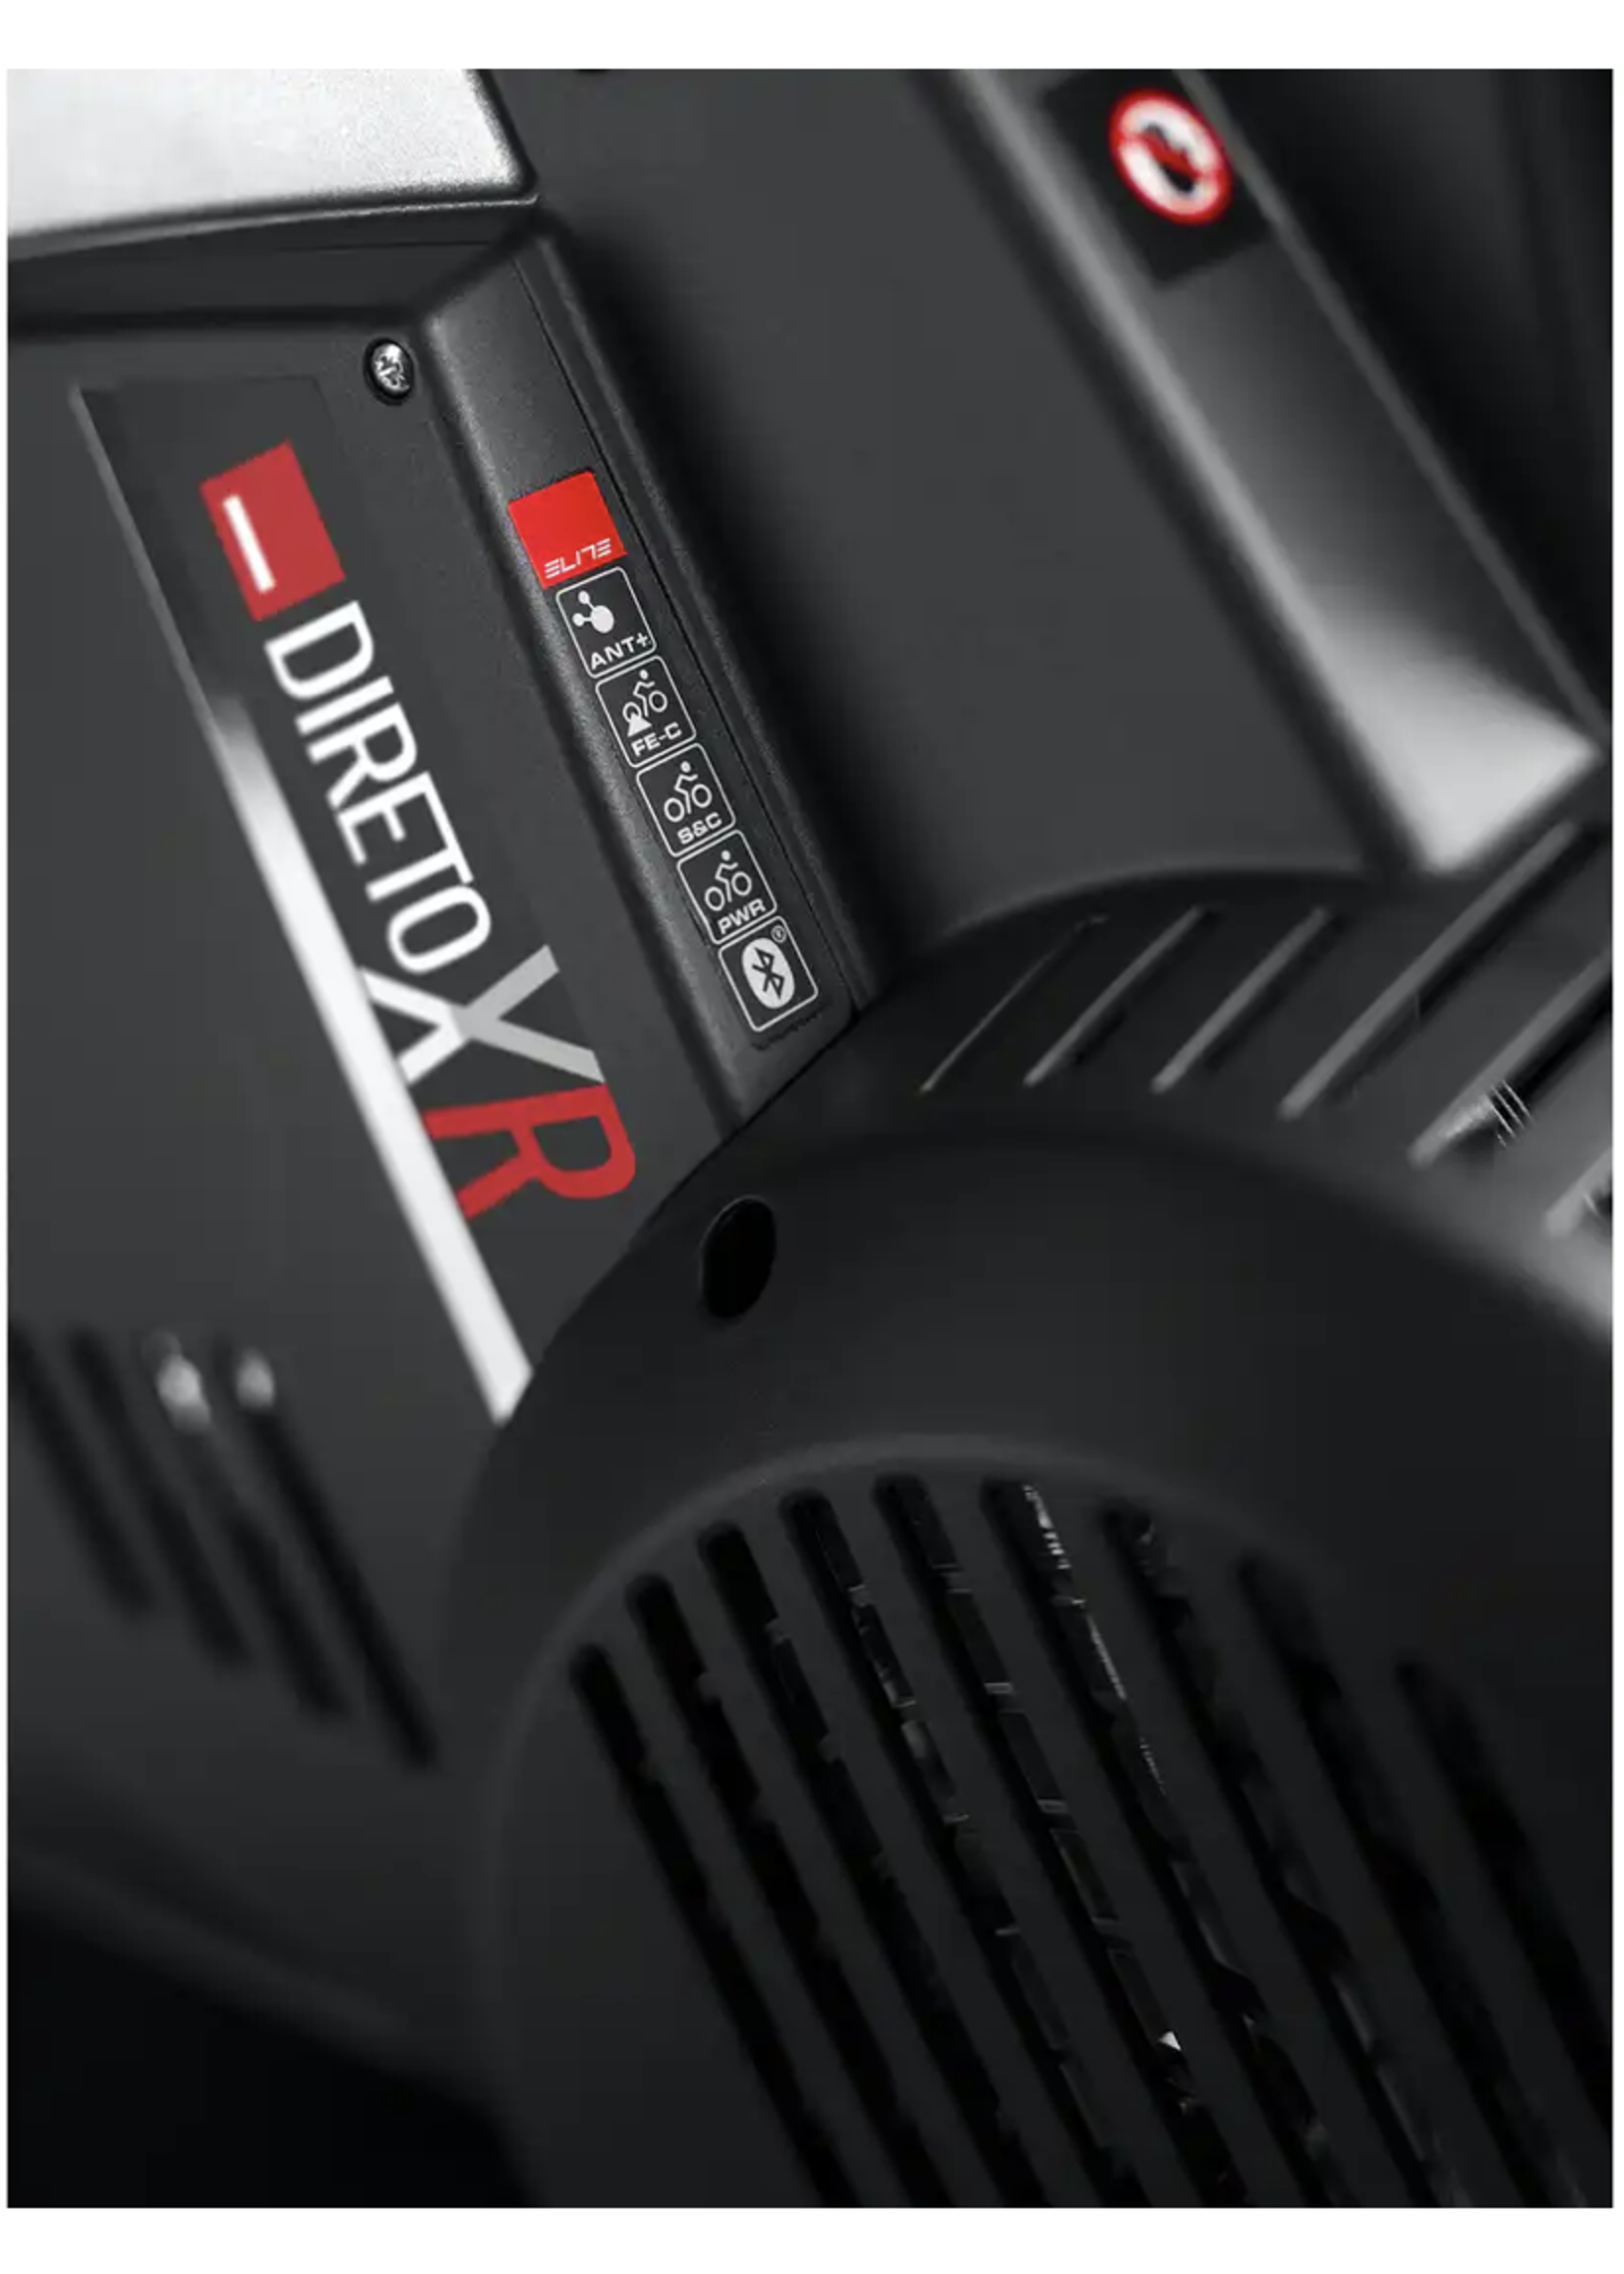 ELITE Direto XR Direct Drive Interactive Trainer